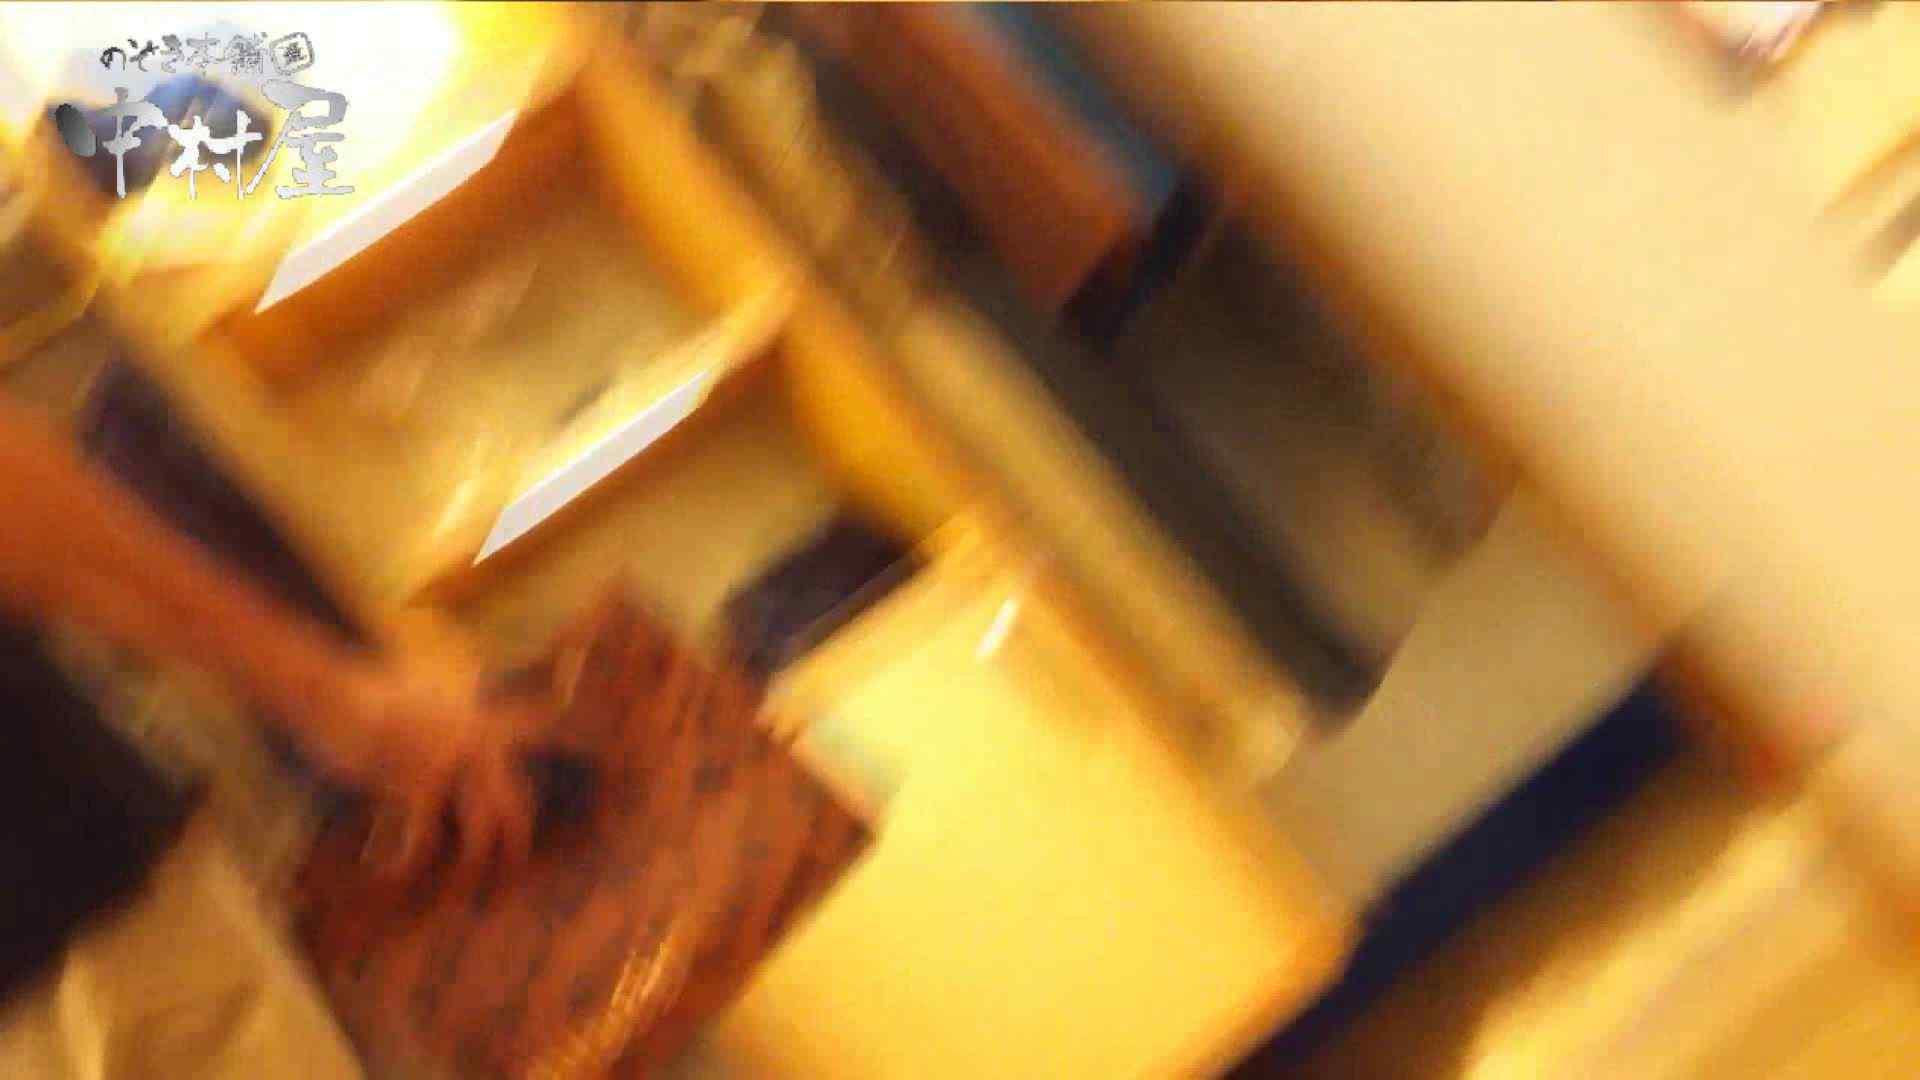 vol.65 美人アパレル胸チラ&パンチラ ムッチリ感がいい感じ花がらパンツさん チラ  106連発 28